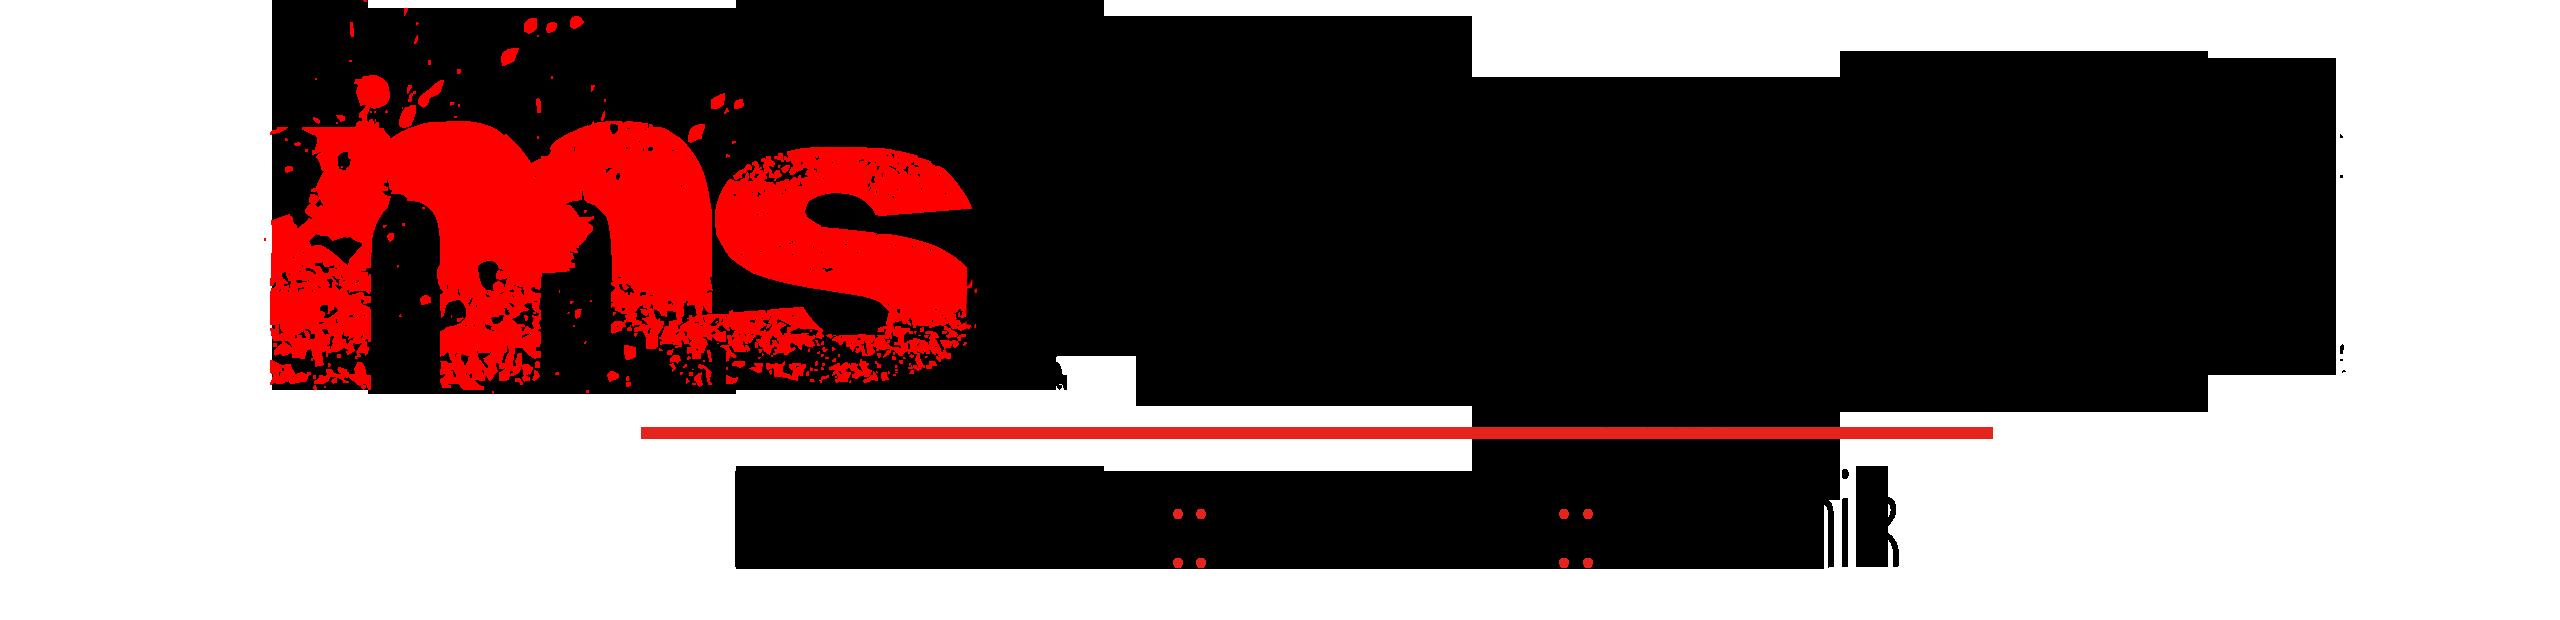 MS logo2019 RWB